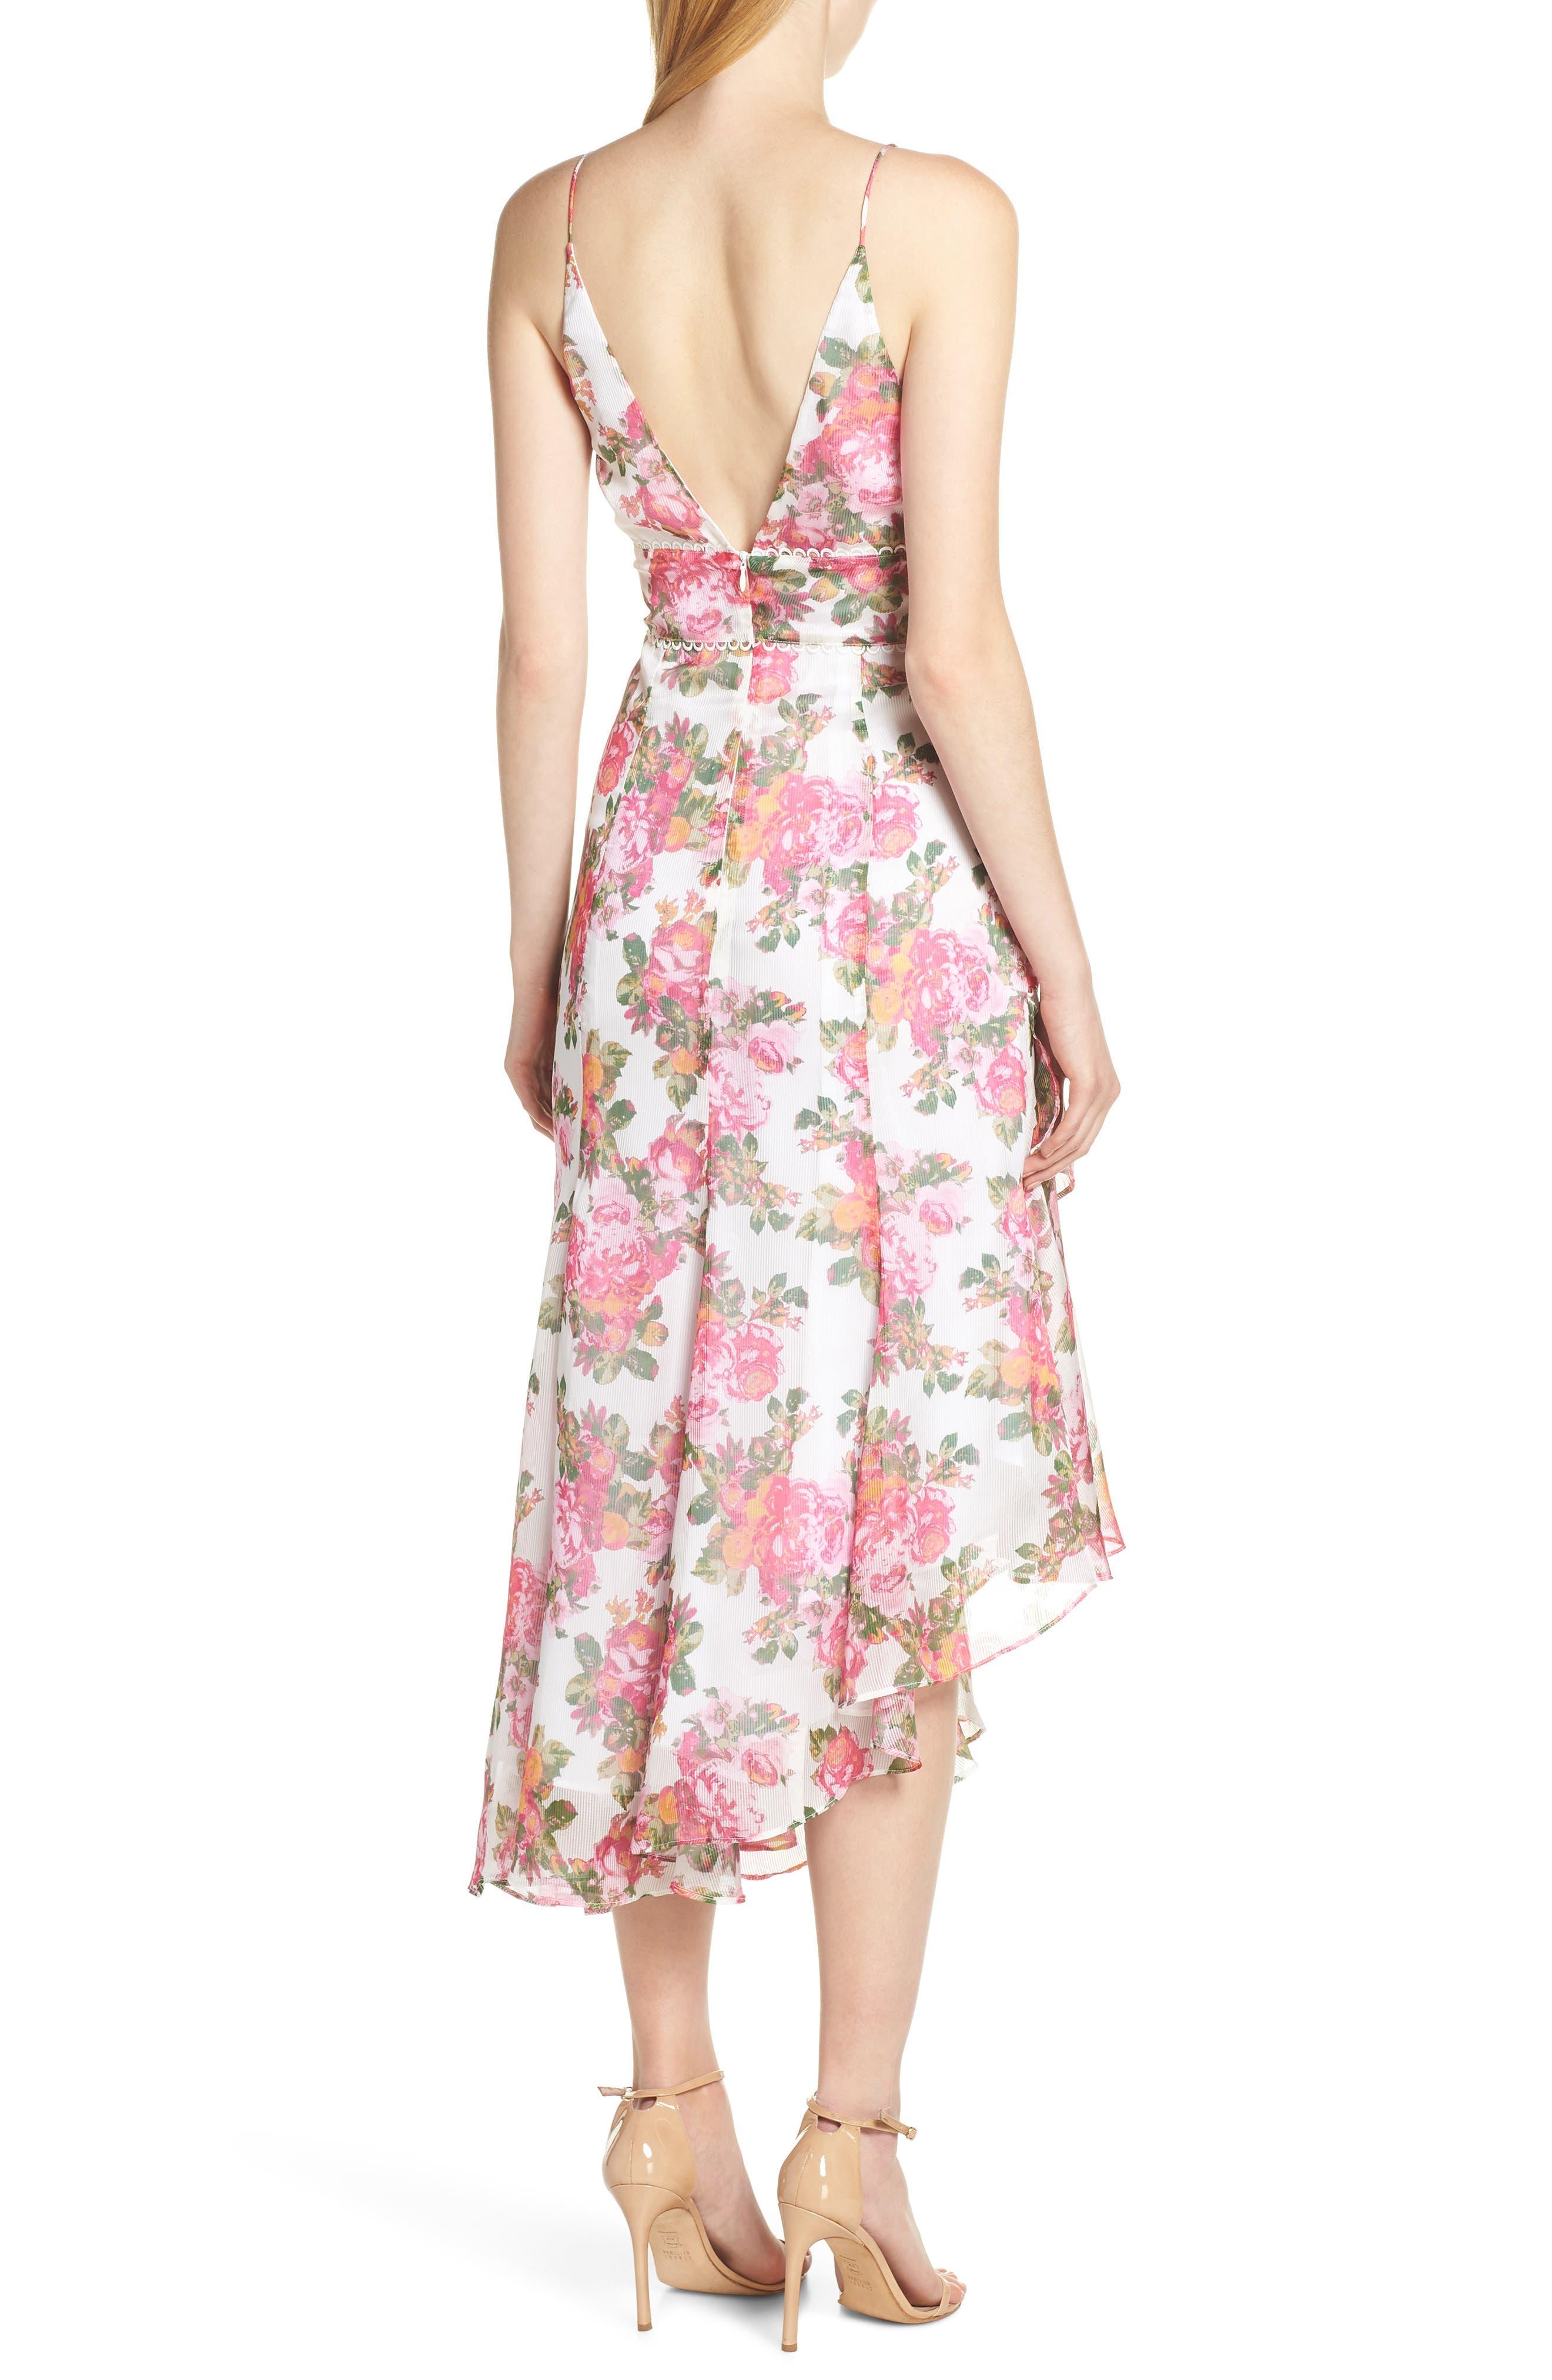 c41ffbb60a097 Women's Keepsake The Label Dresses | Nordstrom